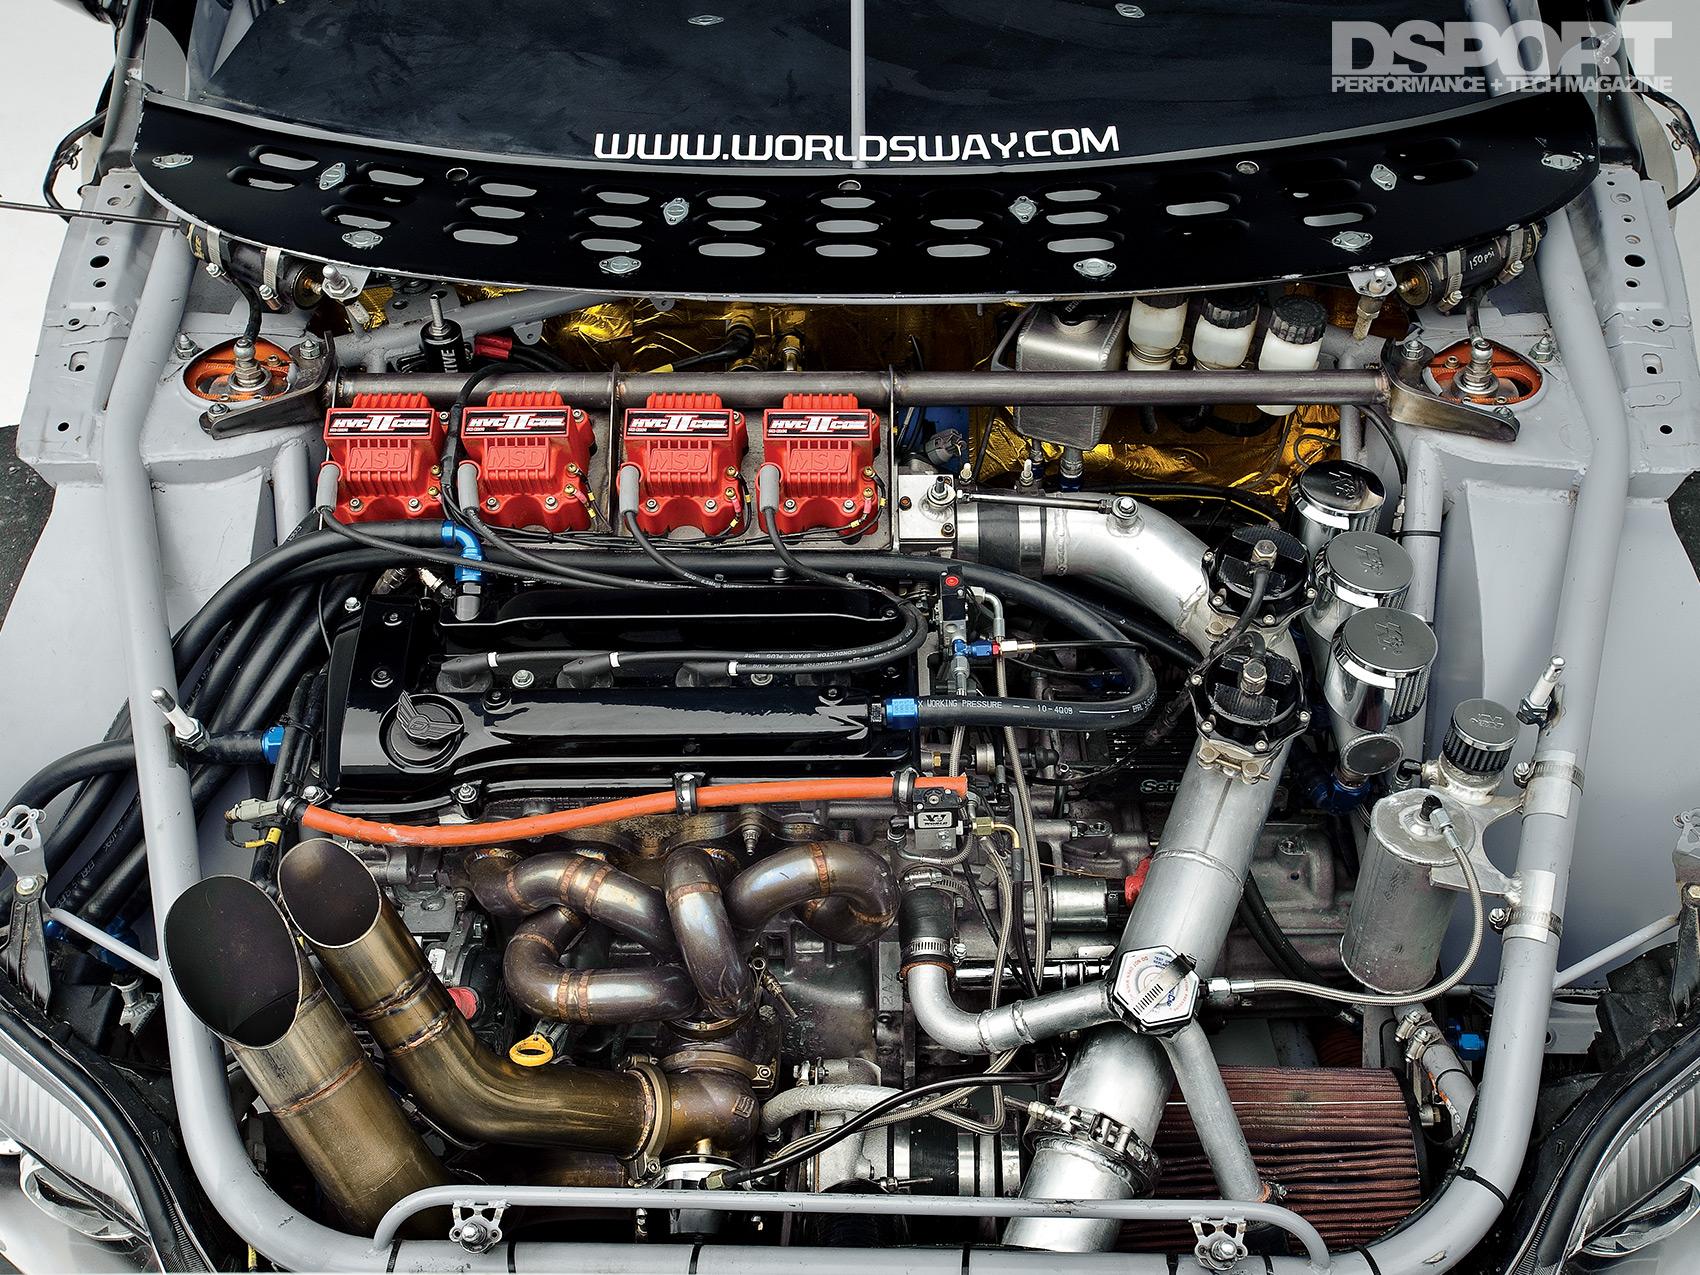 Scion Tc Mixes Aerodynamics And Horsepower To Set Records